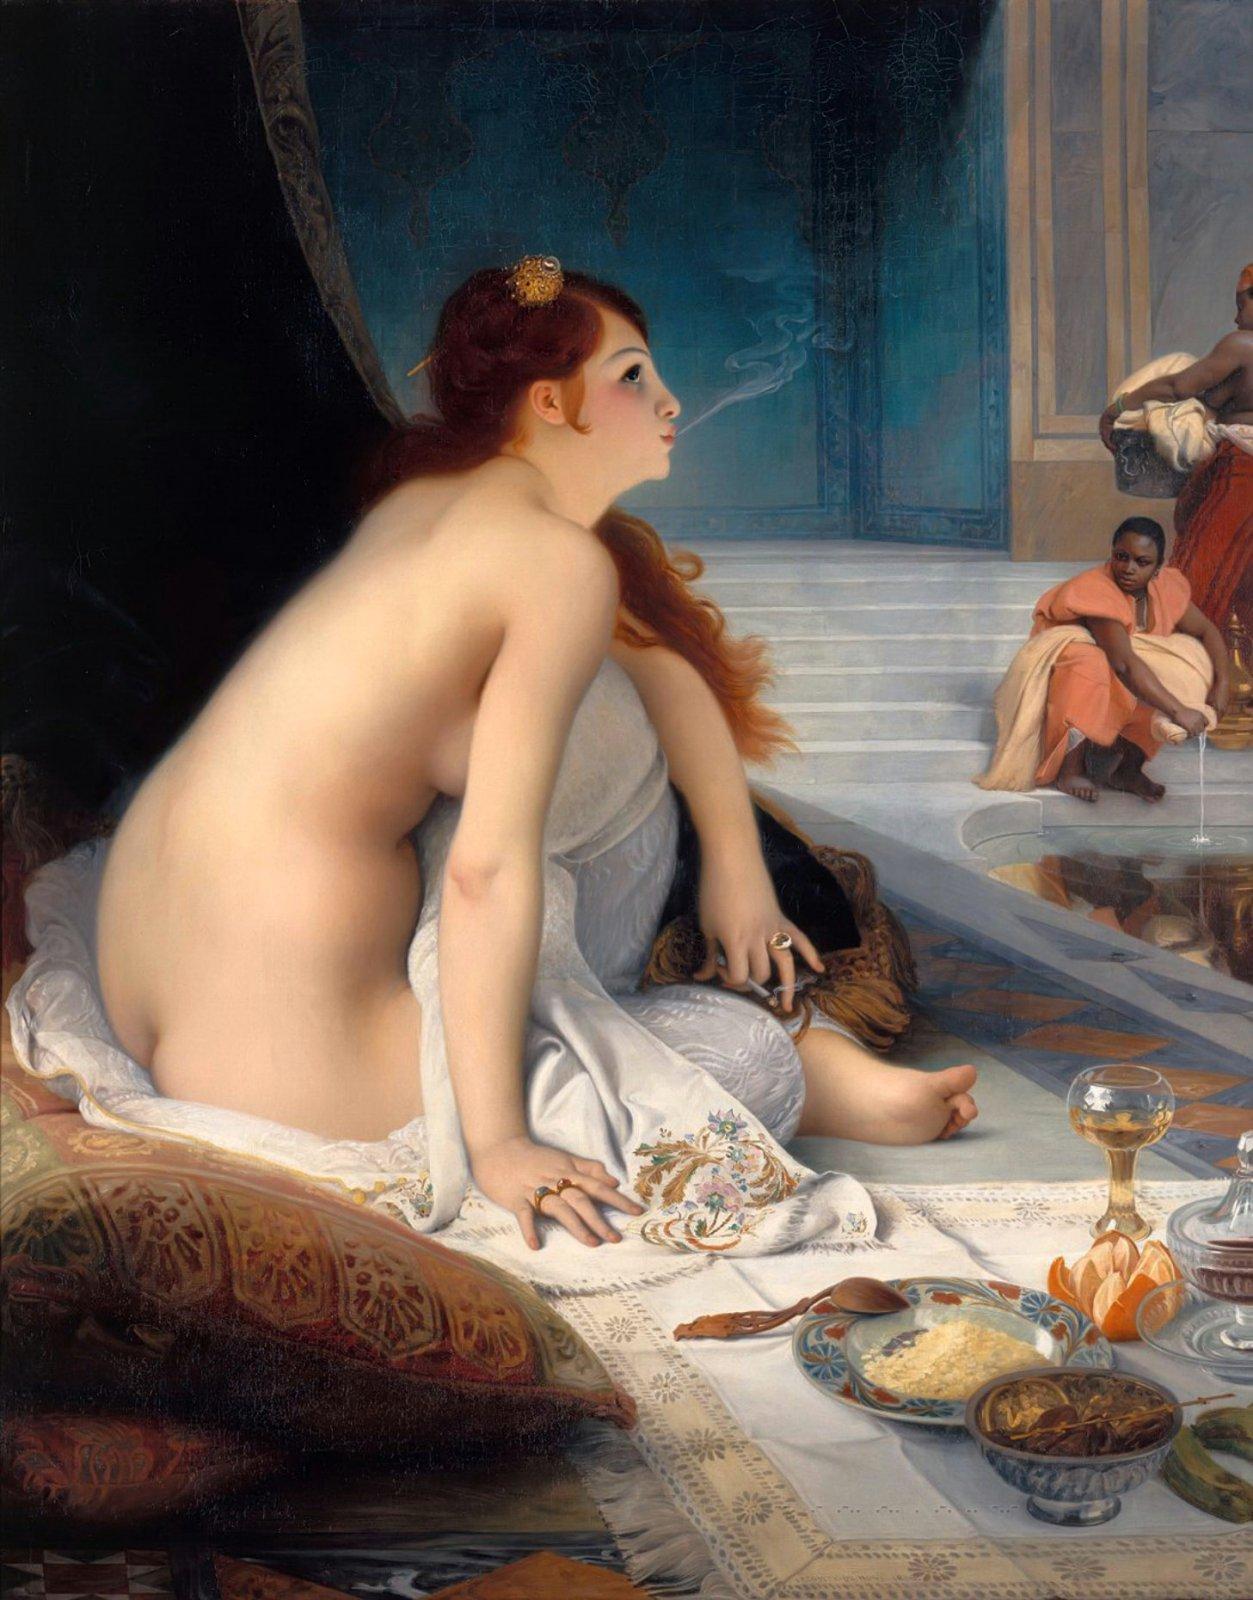 Porn iran pecture nude streaming